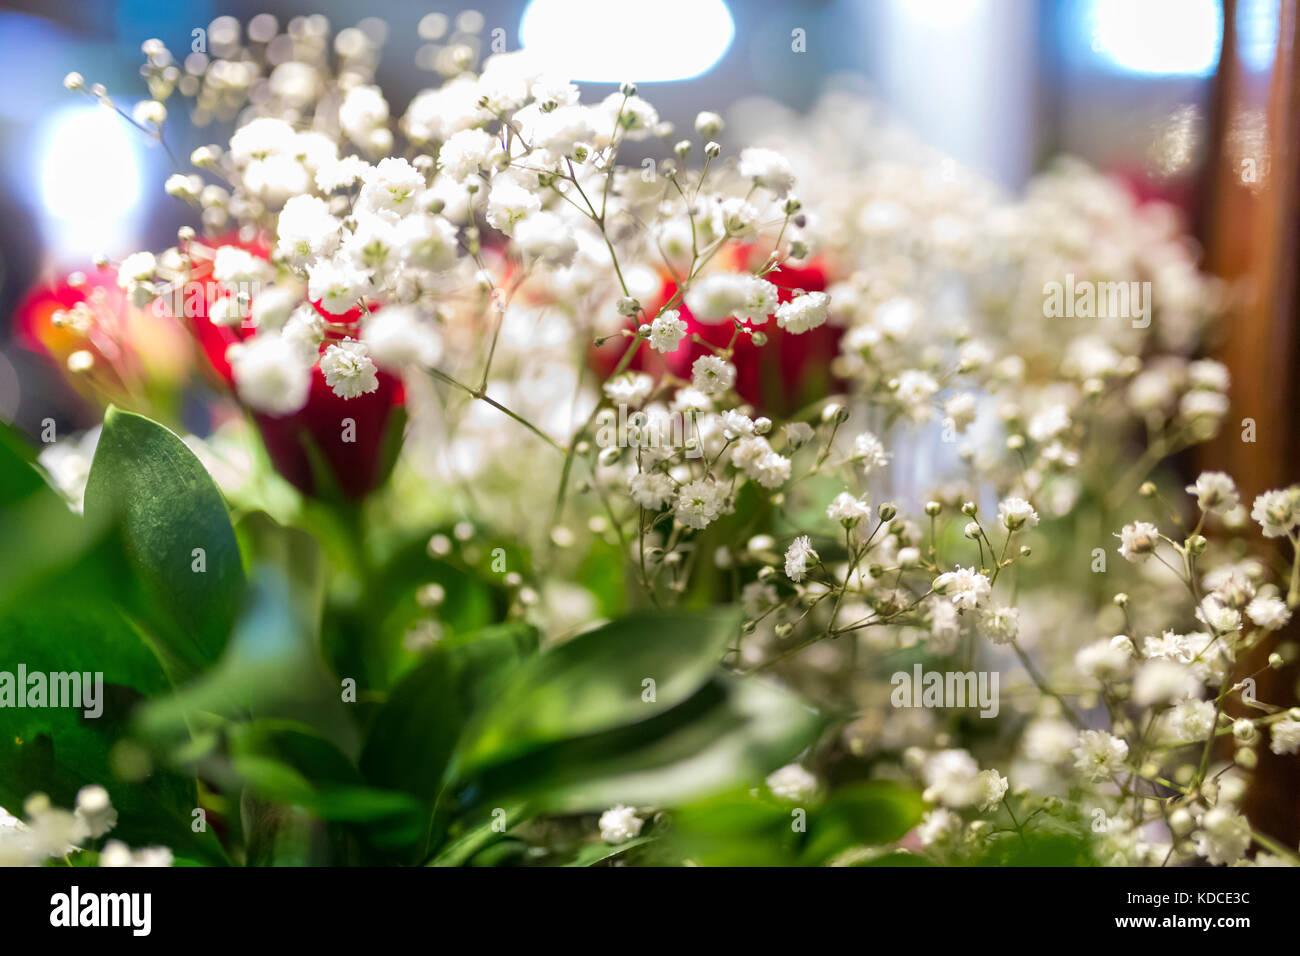 White gypsophila babies breath Bristol Fairy flowers close up in a ...